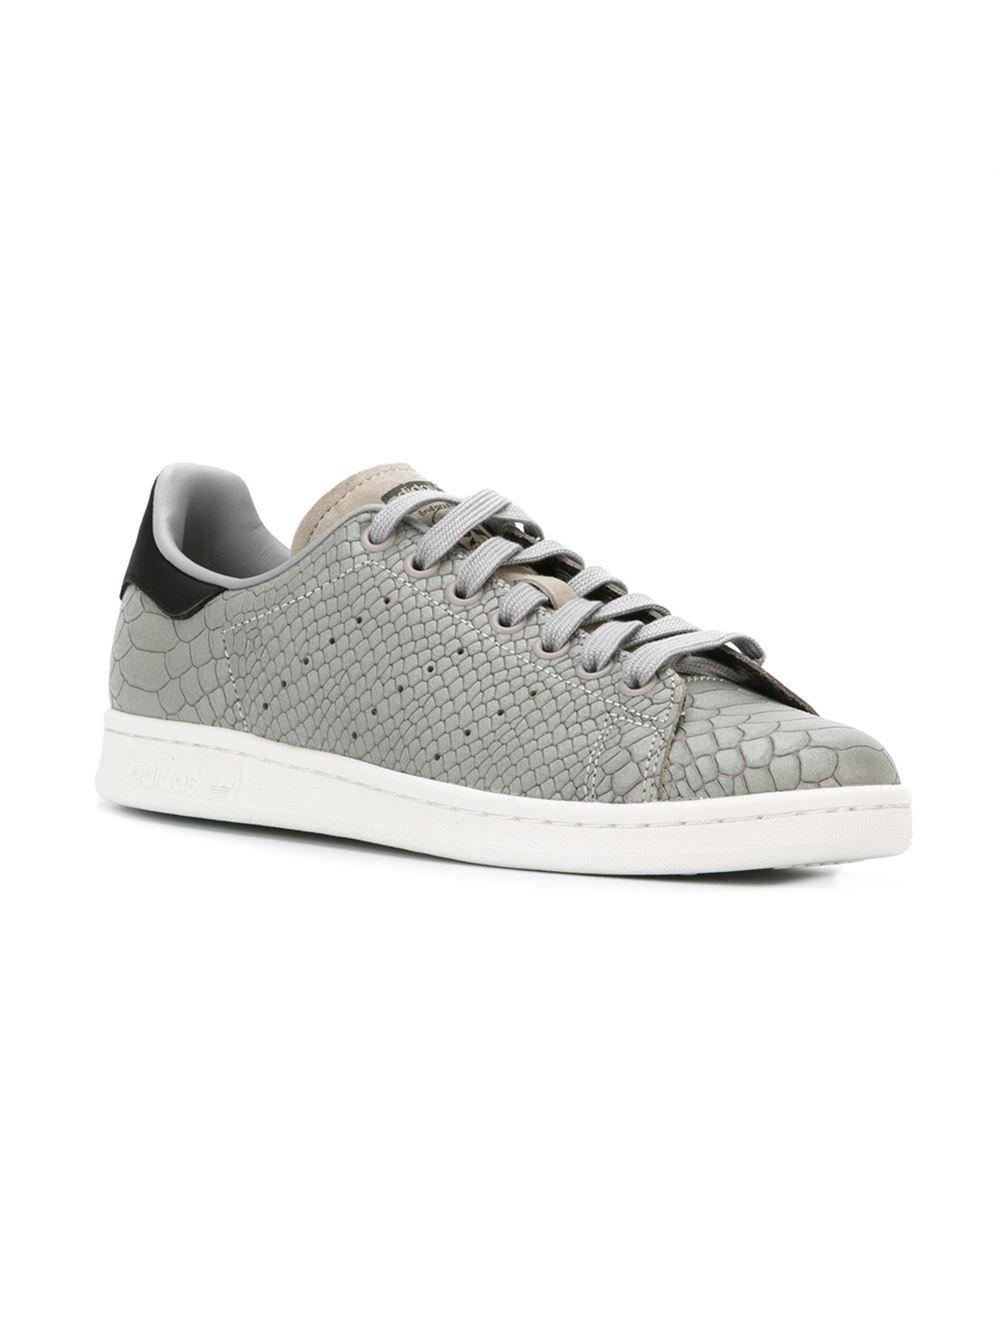 Adidas Stan Smith gray python skin effect sneaker